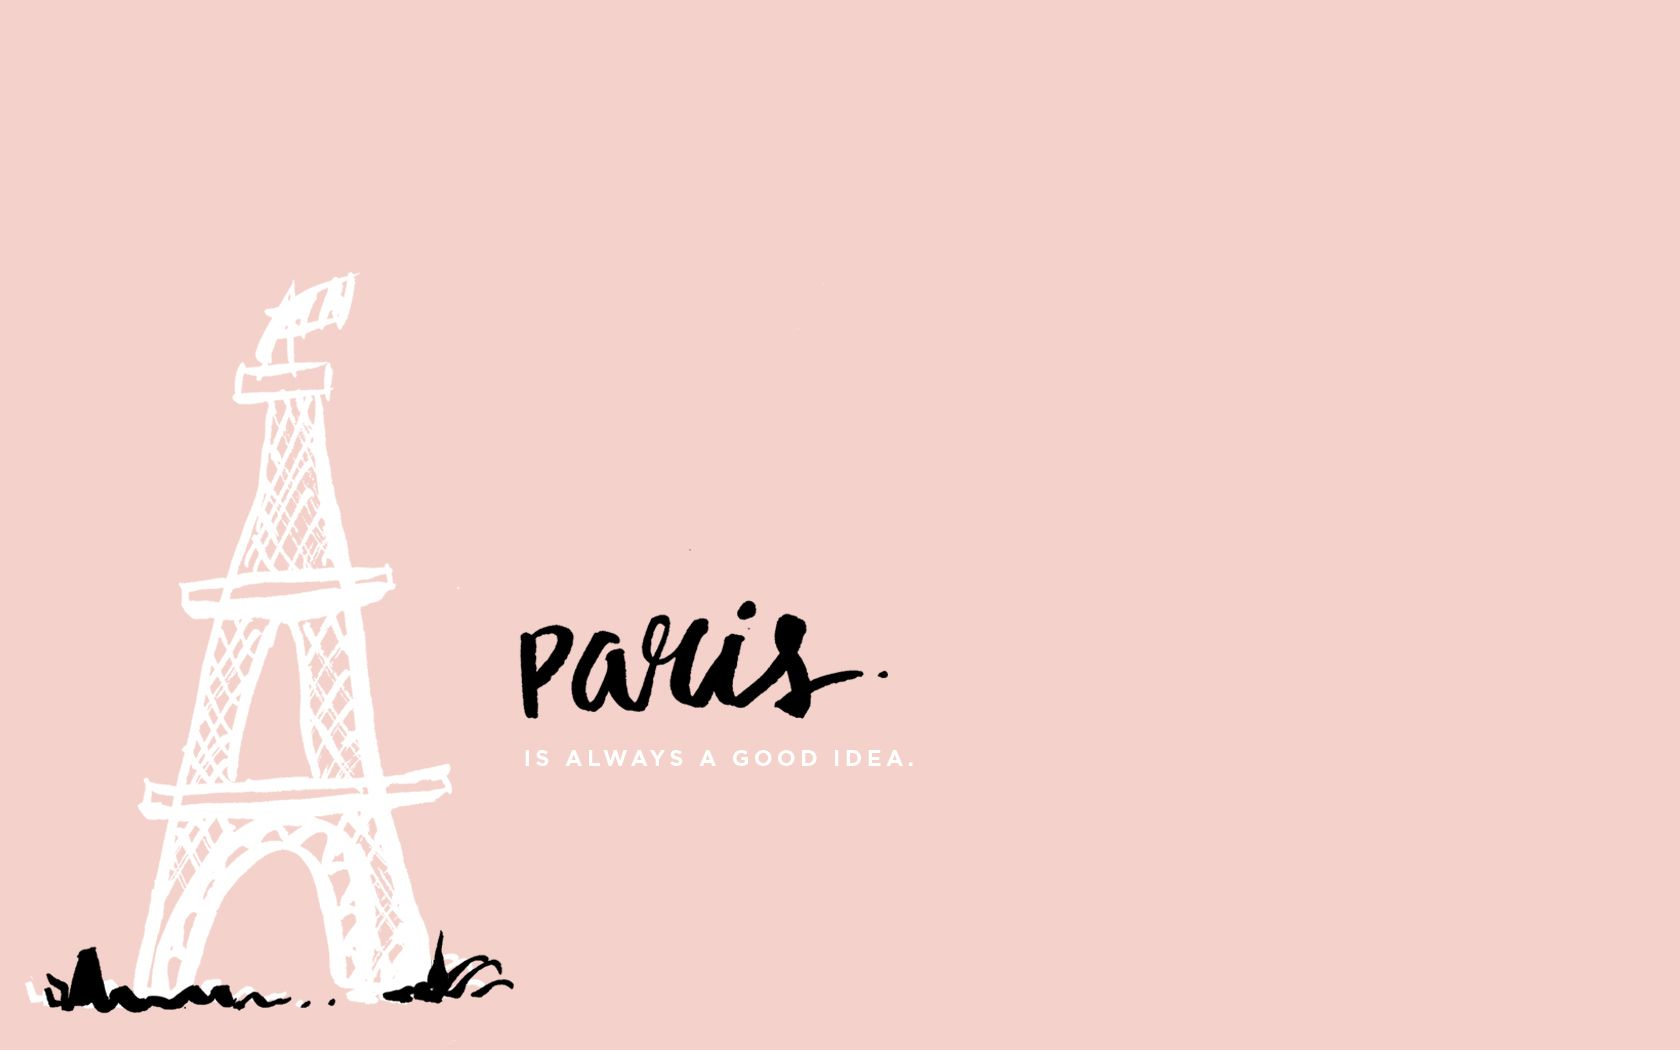 Free desktop + mobile wallpaper via hellodesignsugar - PARIS IS ALWAYS A GOOD IDEA.   Desktop ...